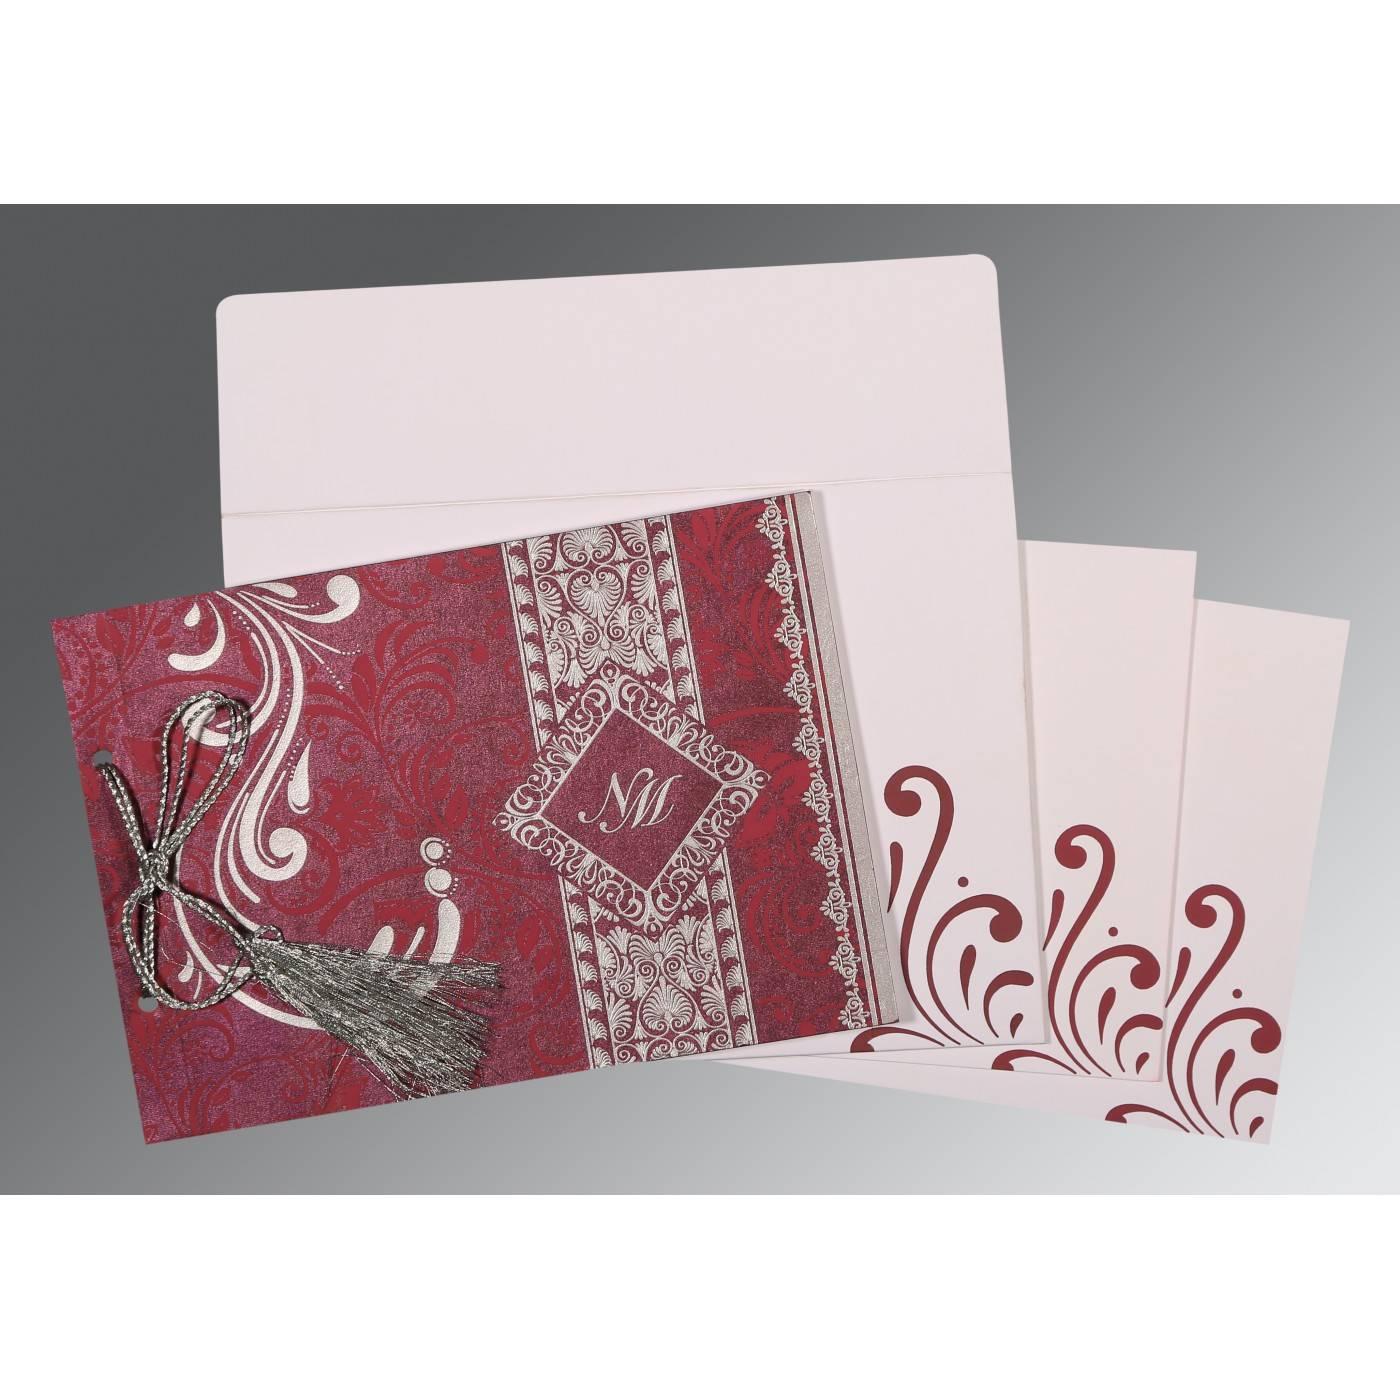 RAISIN SHIMMERY SCREEN PRINTED WEDDING CARD : CIN-8223J - IndianWeddingCards